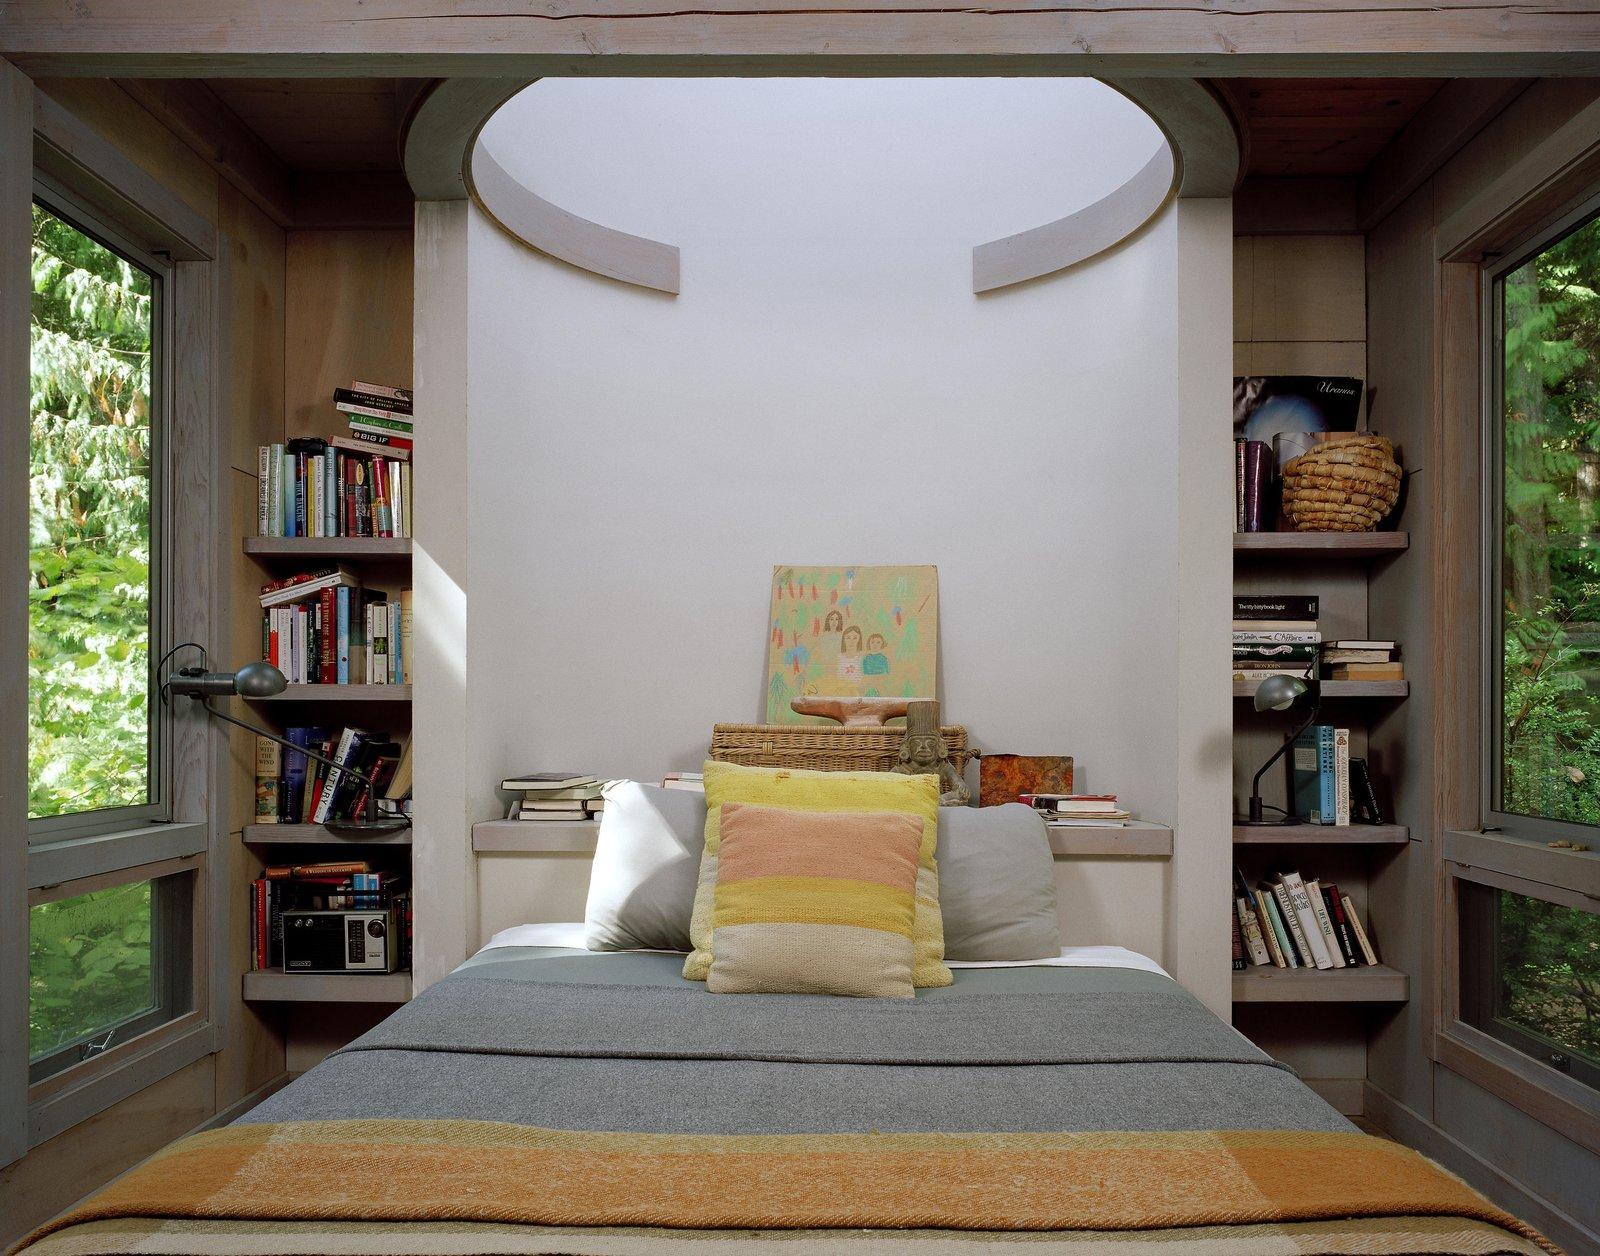 Bedroom and Bed Cabin at Longbranch | Olson Kundig  Cabin in Longbranch